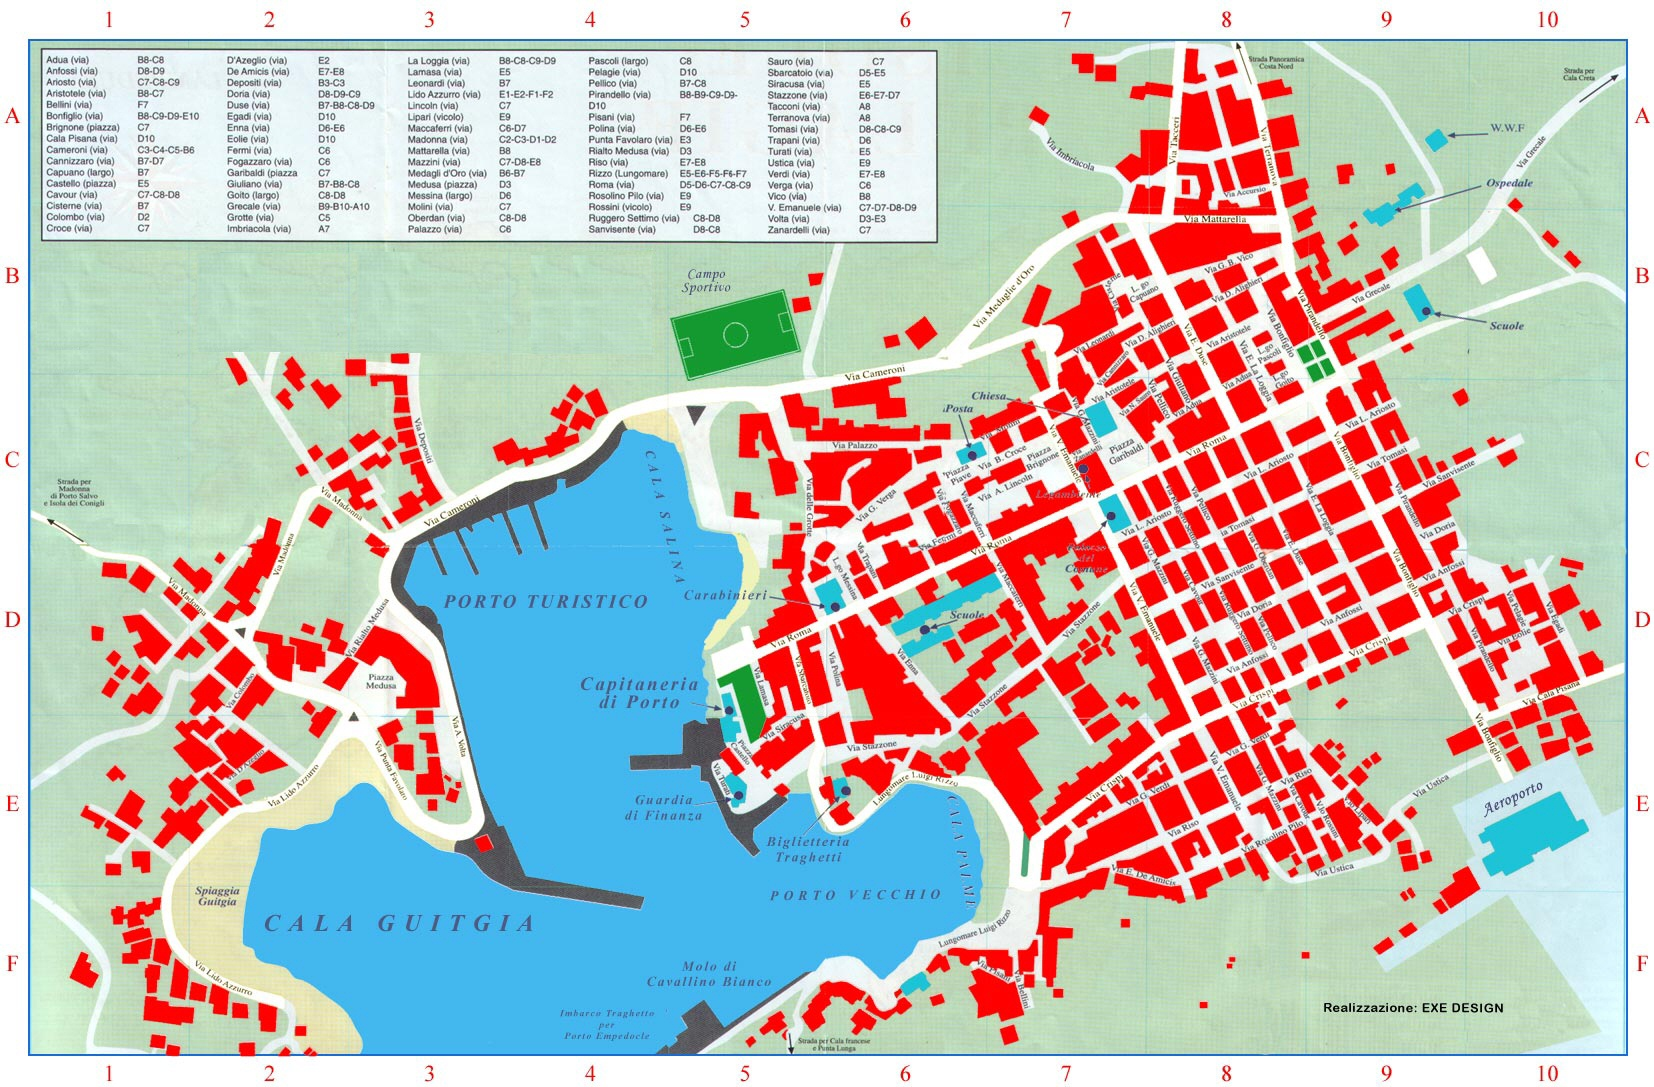 Lampedusa Cartina Dettagliata.Mappa Di Lampedusa Mappa Dal Satellite Di Lampedusa Carta Lampedusa Stradario Lampedusa